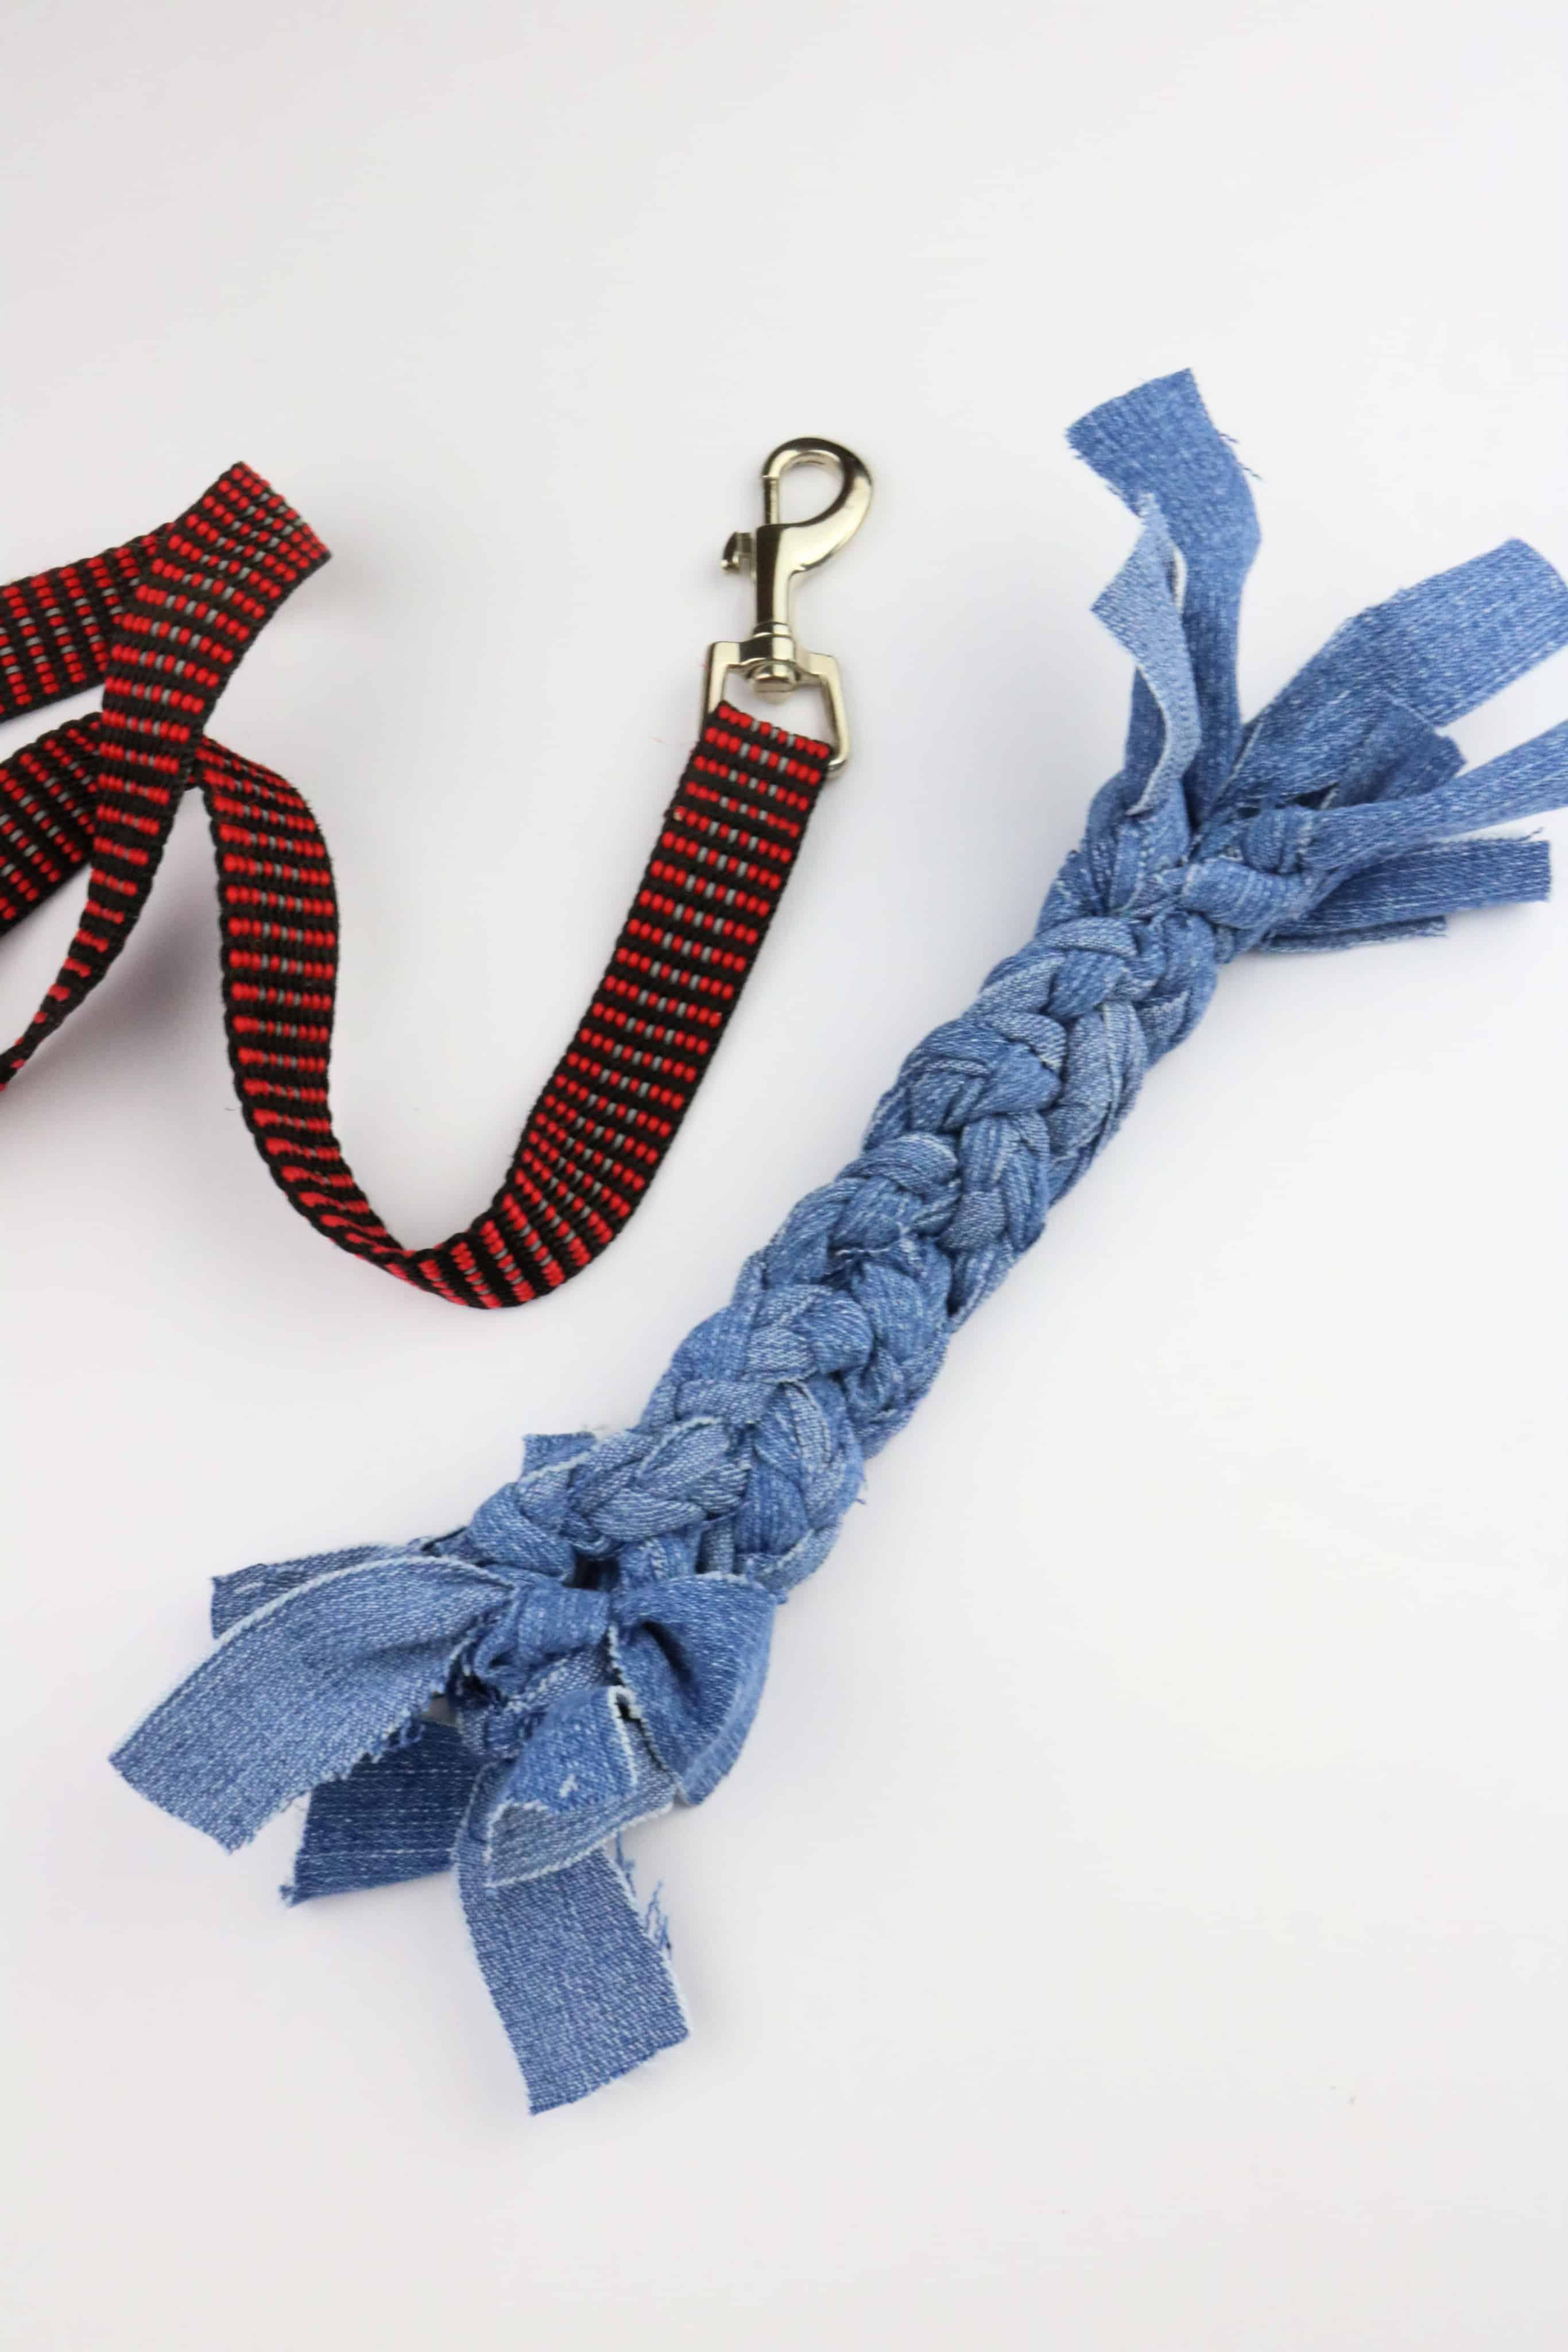 handmade Denim Dog Toy with leash on white background